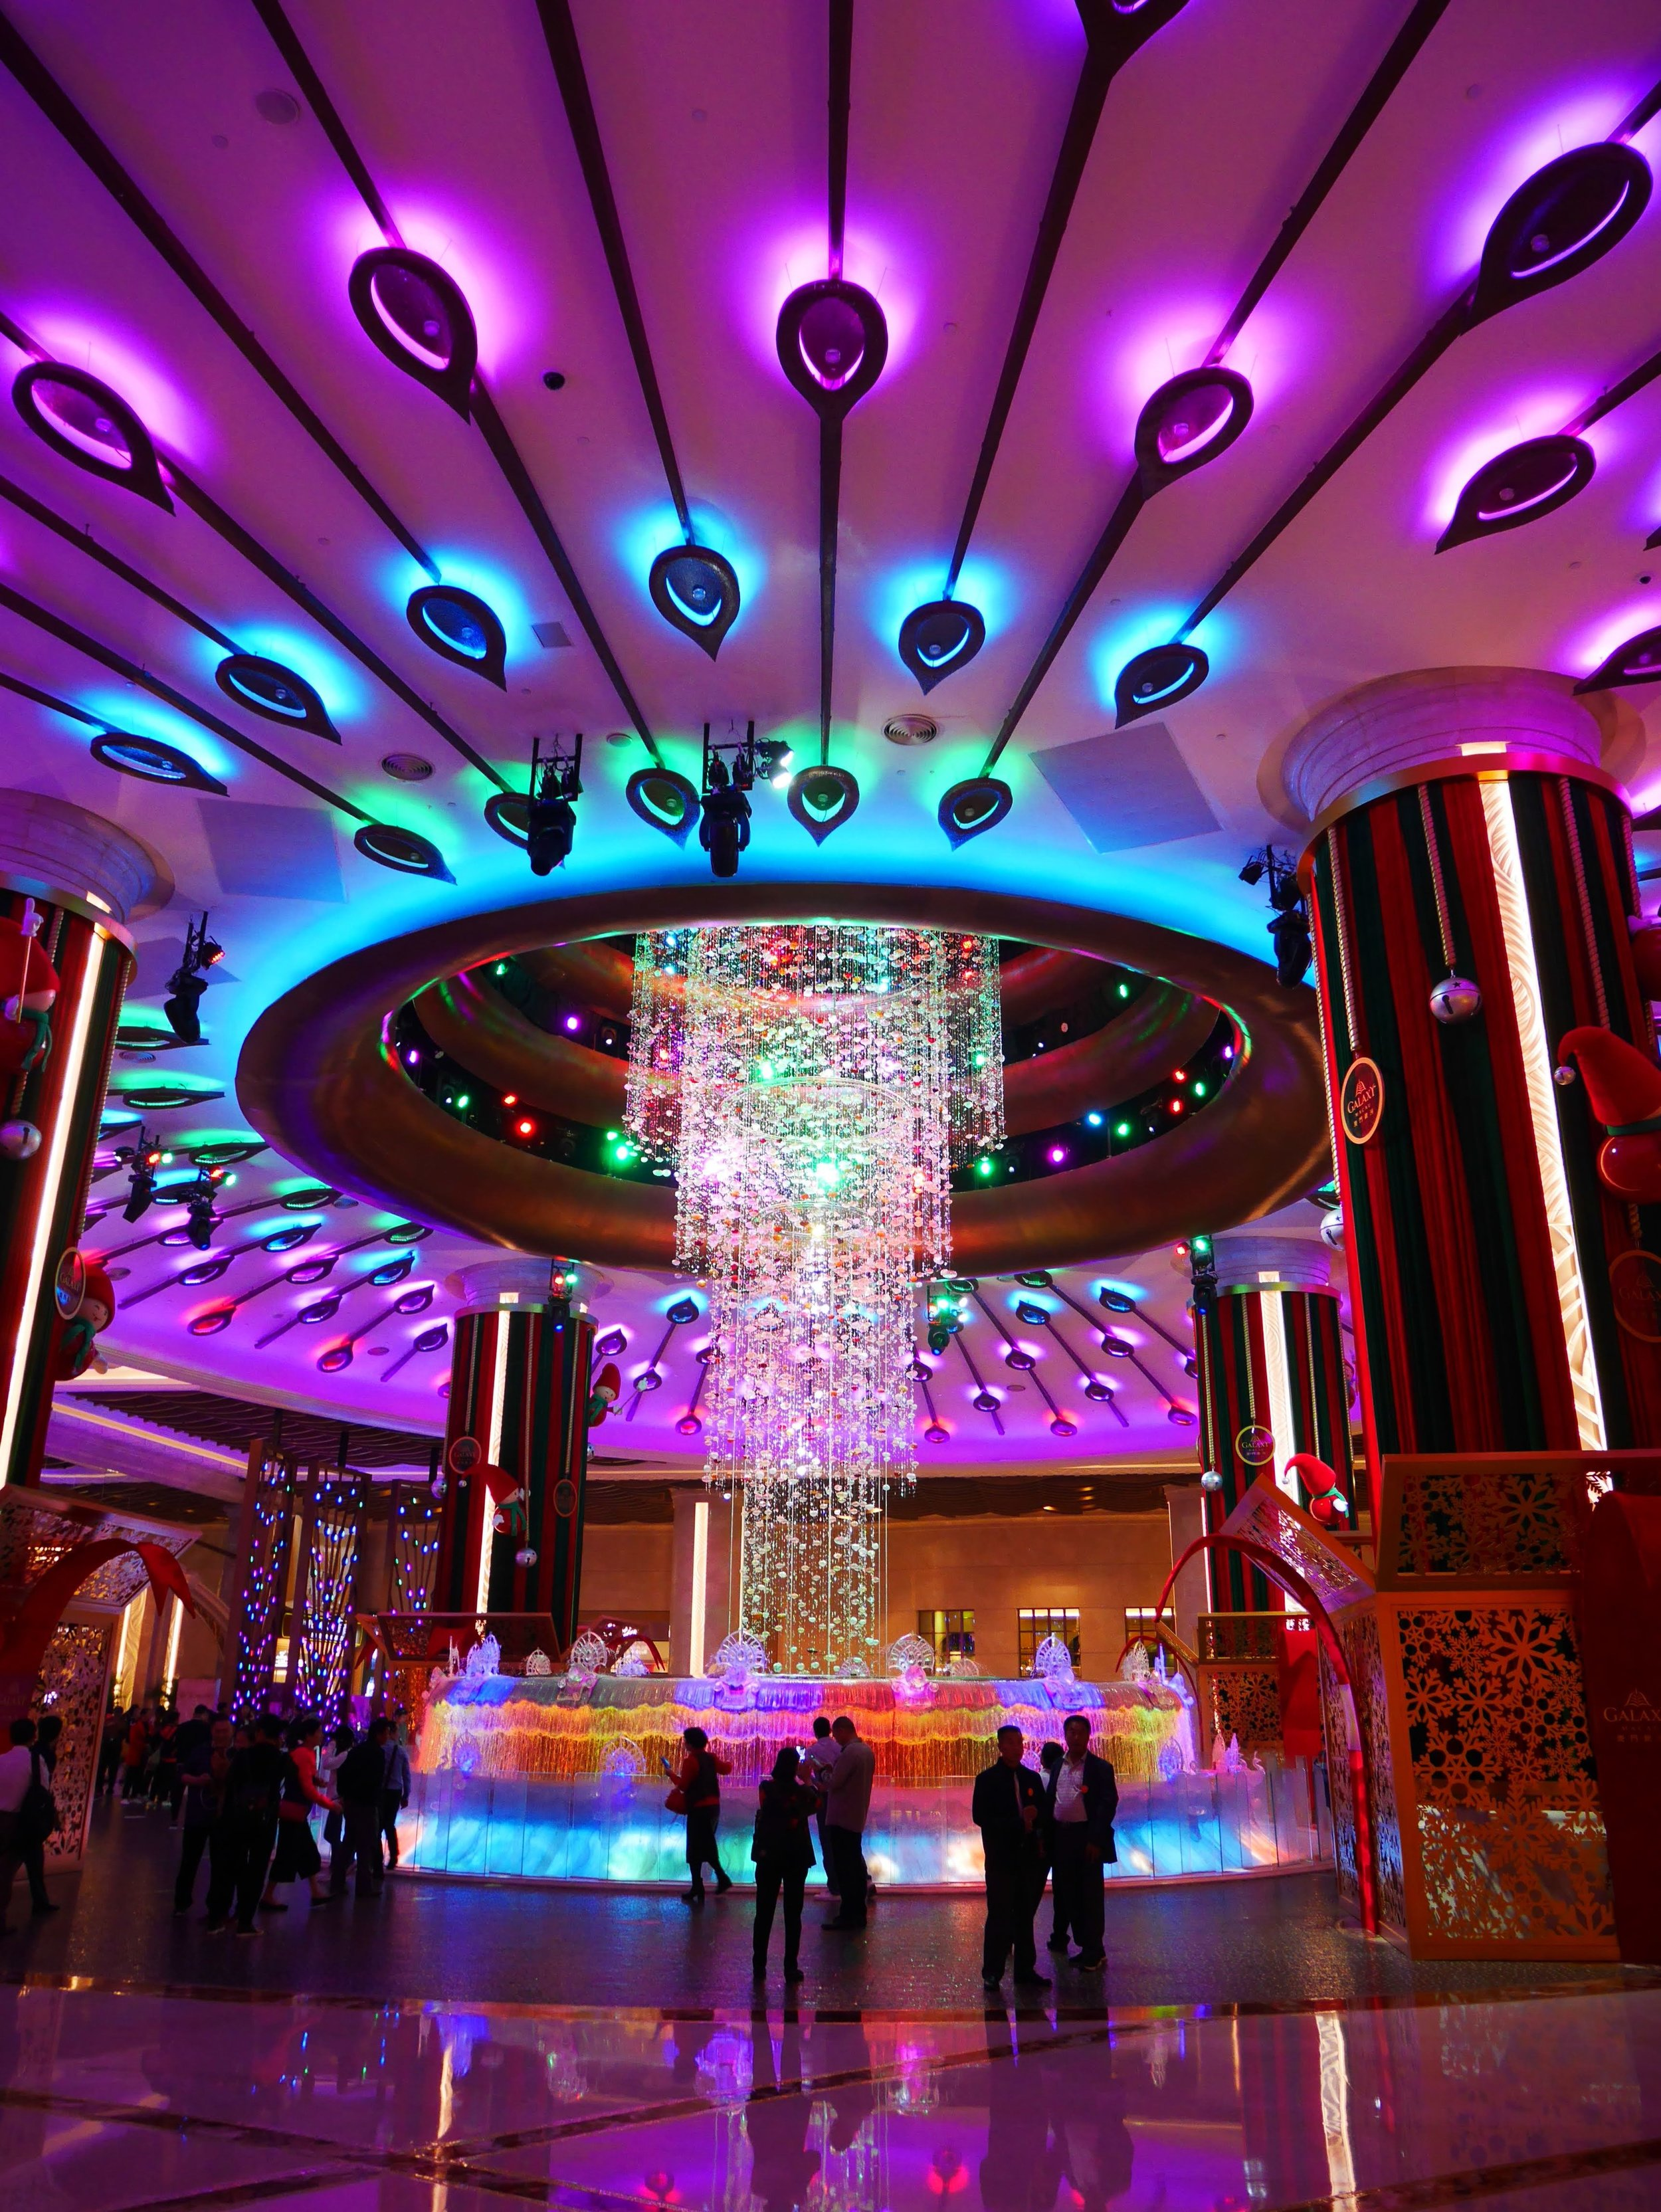 interior fountain at the Galaxy Macau hotel and casino